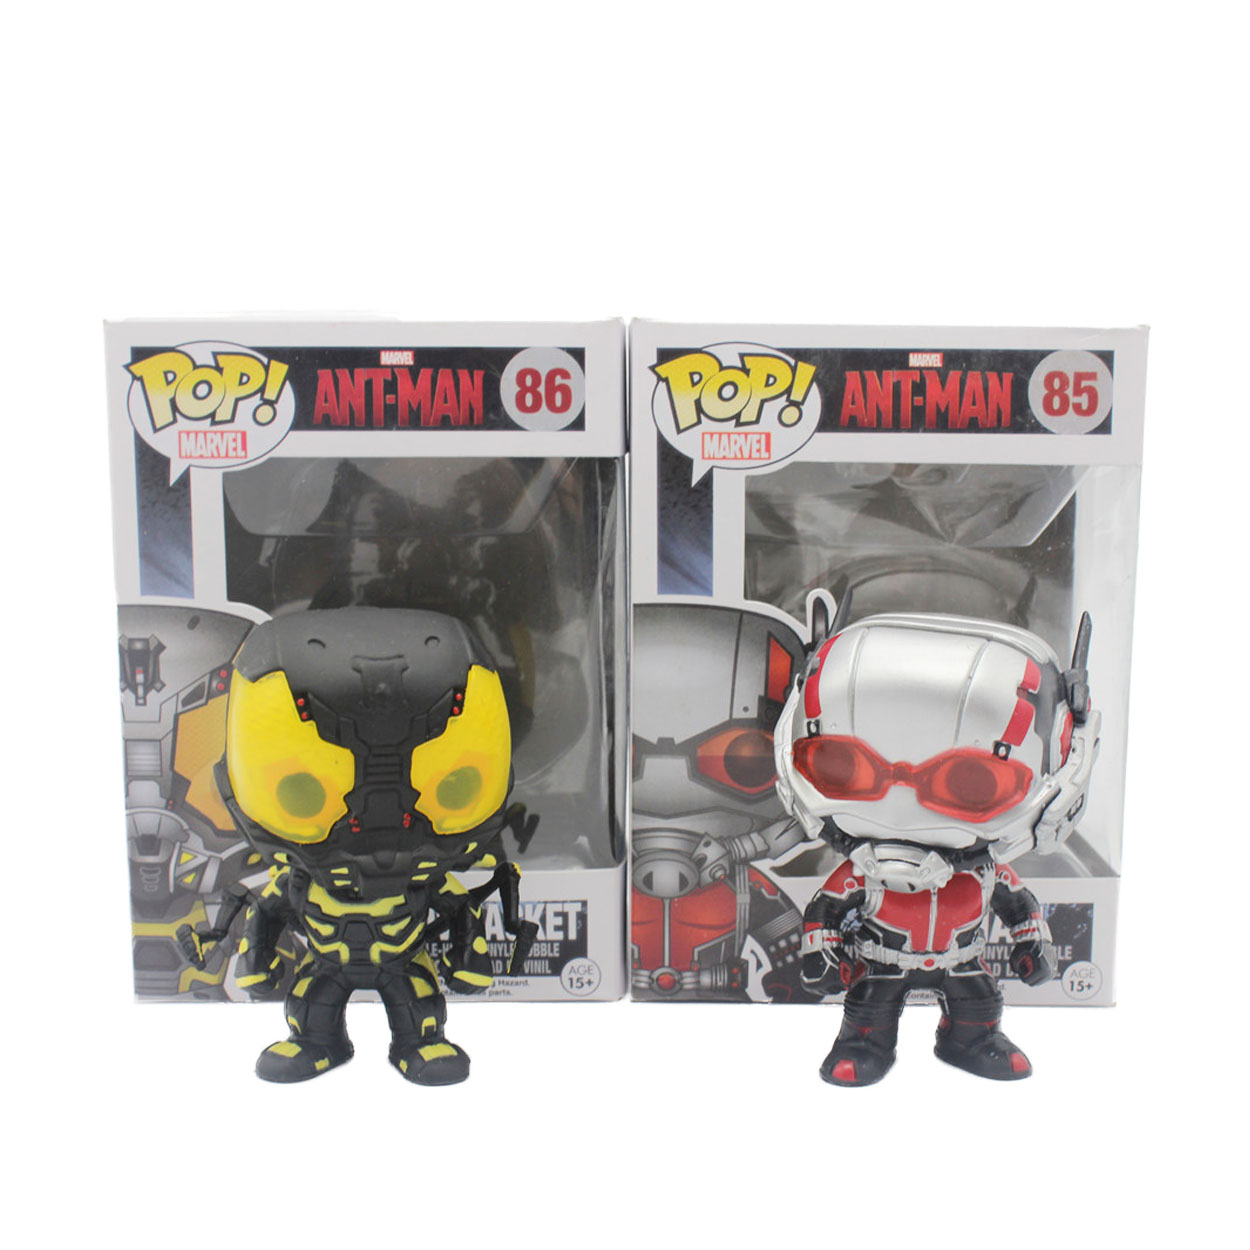 Funko Pop Bobble Head Figure Marvel the Avengers Civil War 3 Ant-Man Red Yellow Jacket 2color 10CM PVC Vinyl Figure Toy(China (Mainland))